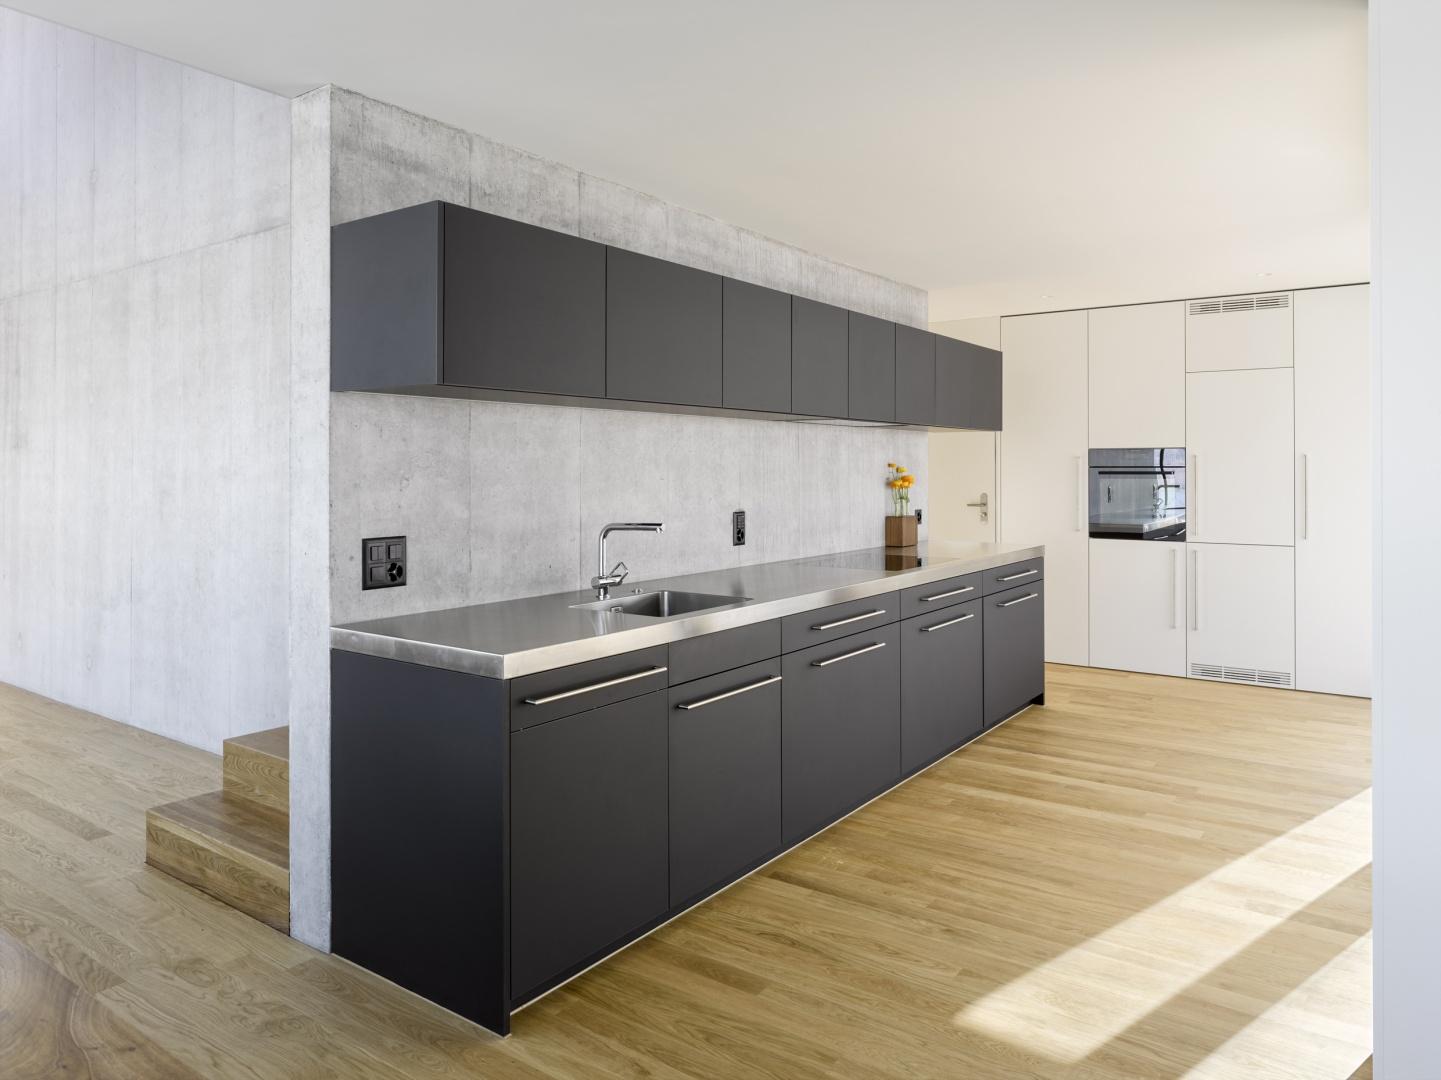 Küche2 © Alexander Gempeler, Architekturfotografie Gempeler, Seidenweg 8a, Postfach 524, 3000 Bern 9